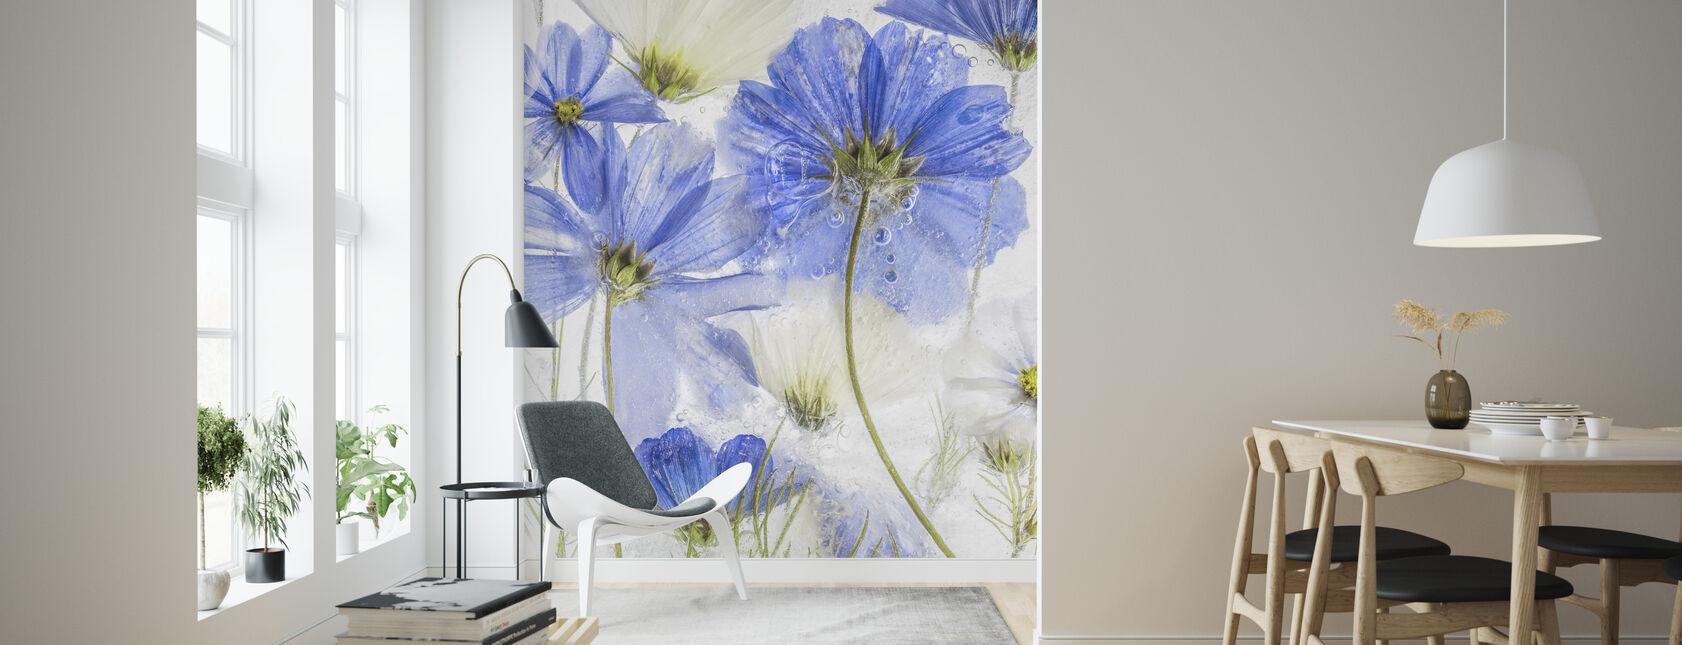 Cosmos Blue - Wallpaper - Living Room